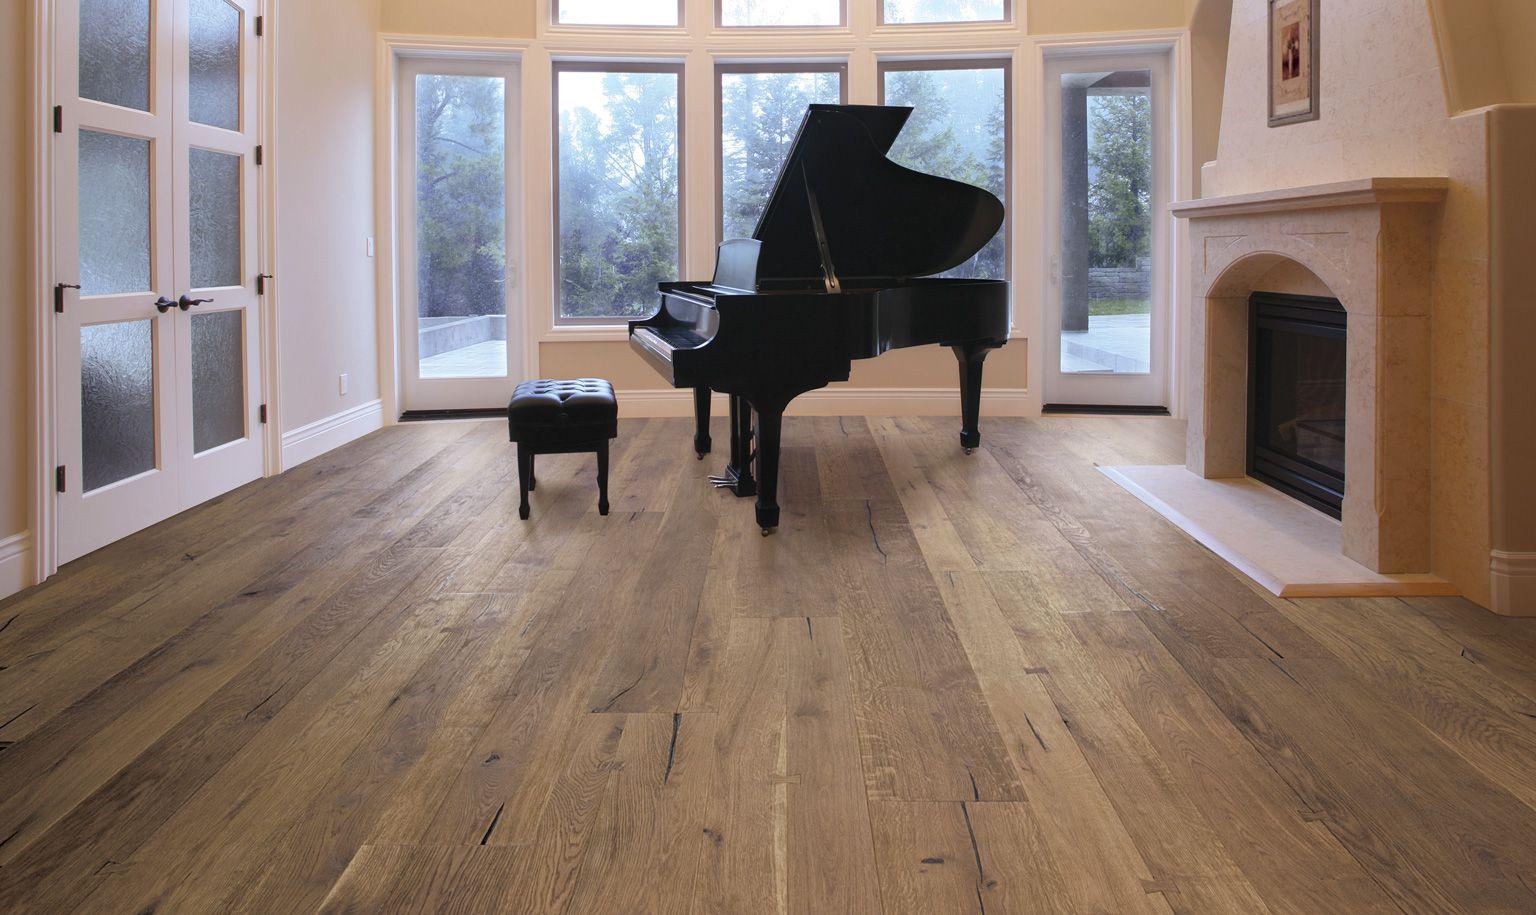 Bach Oak Engineered Wood Flooring, Light Colored Wood